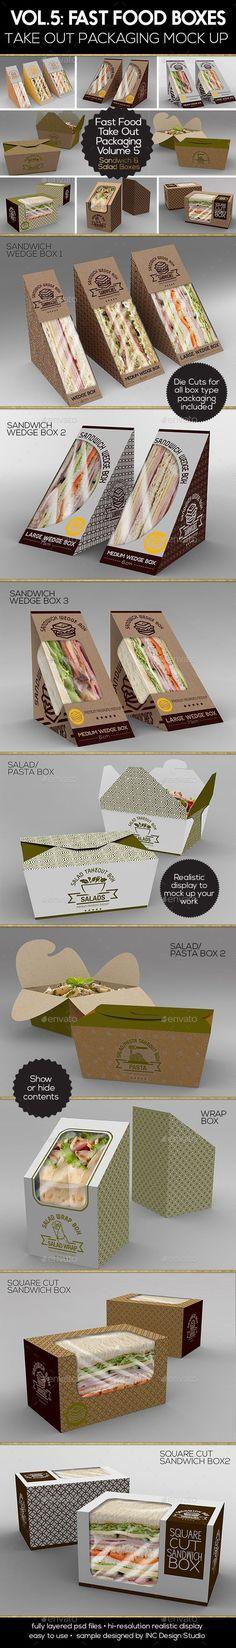 Sandwich Packaging, Bakery Packaging, Food Packaging Design, Beverage Packaging, Food Truck, Sandwich Shops, Sandwich Box, Food Branding, Fast Food